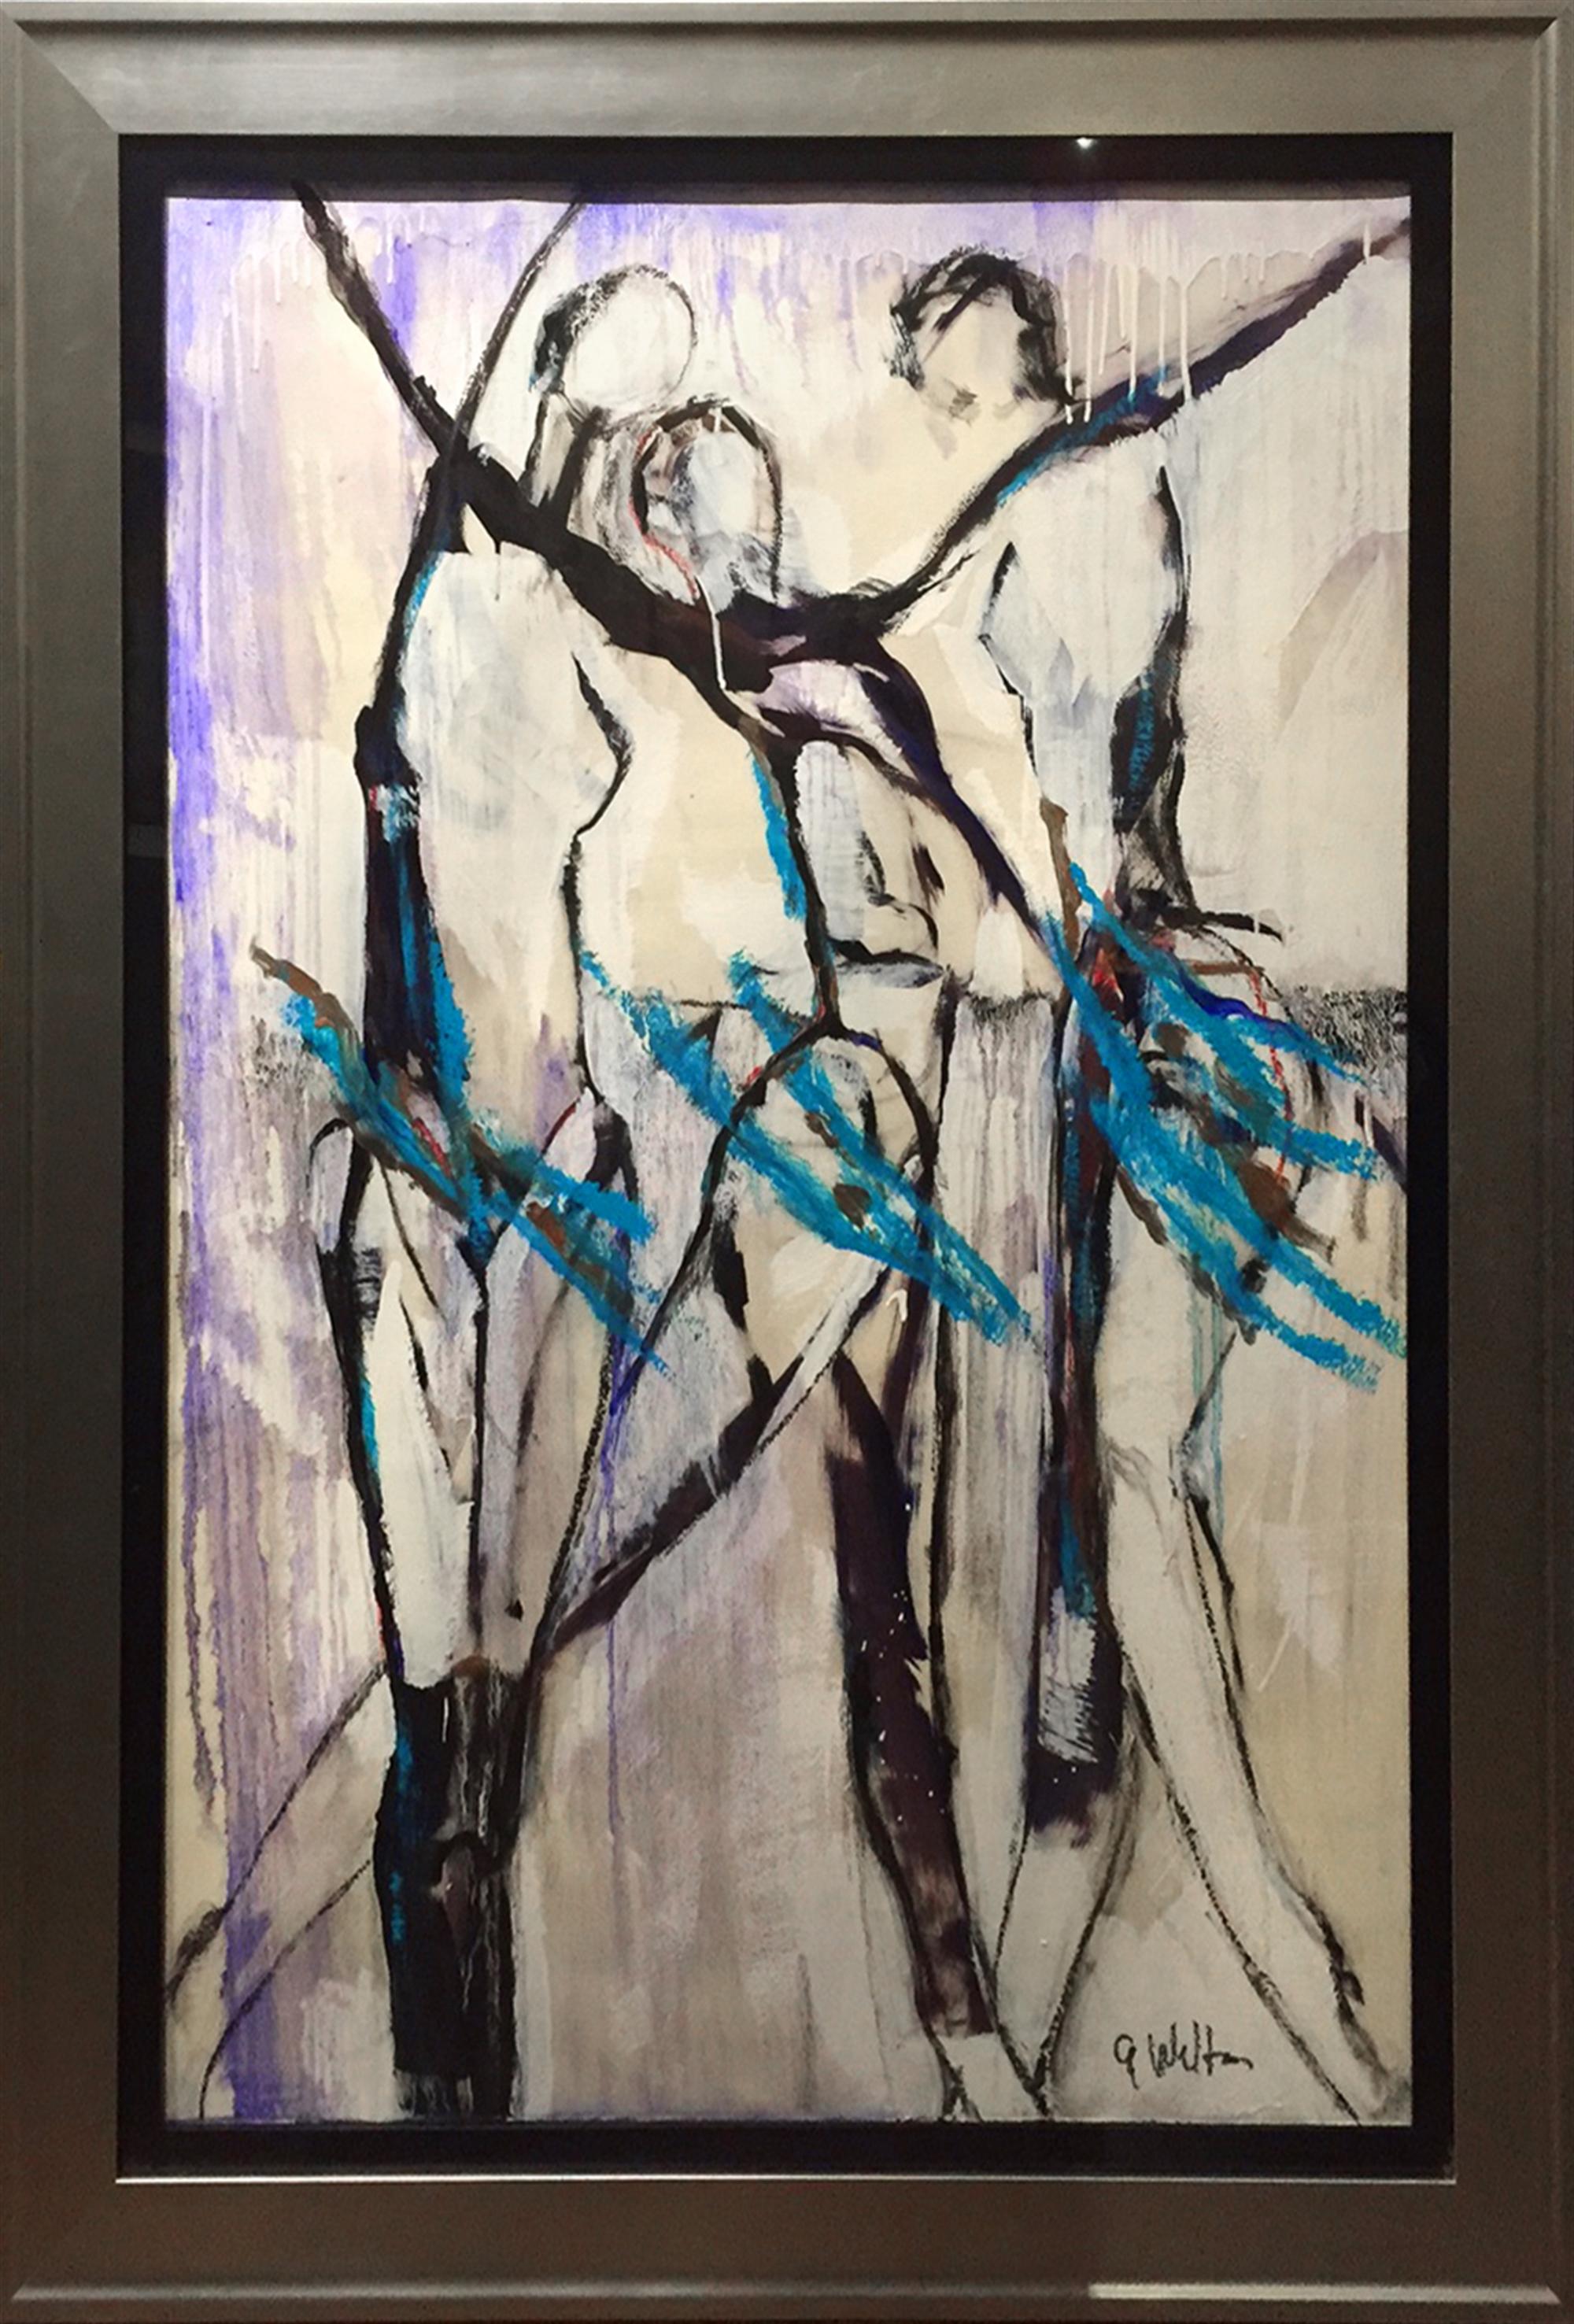 Purple Summer Rain by Gary Welton